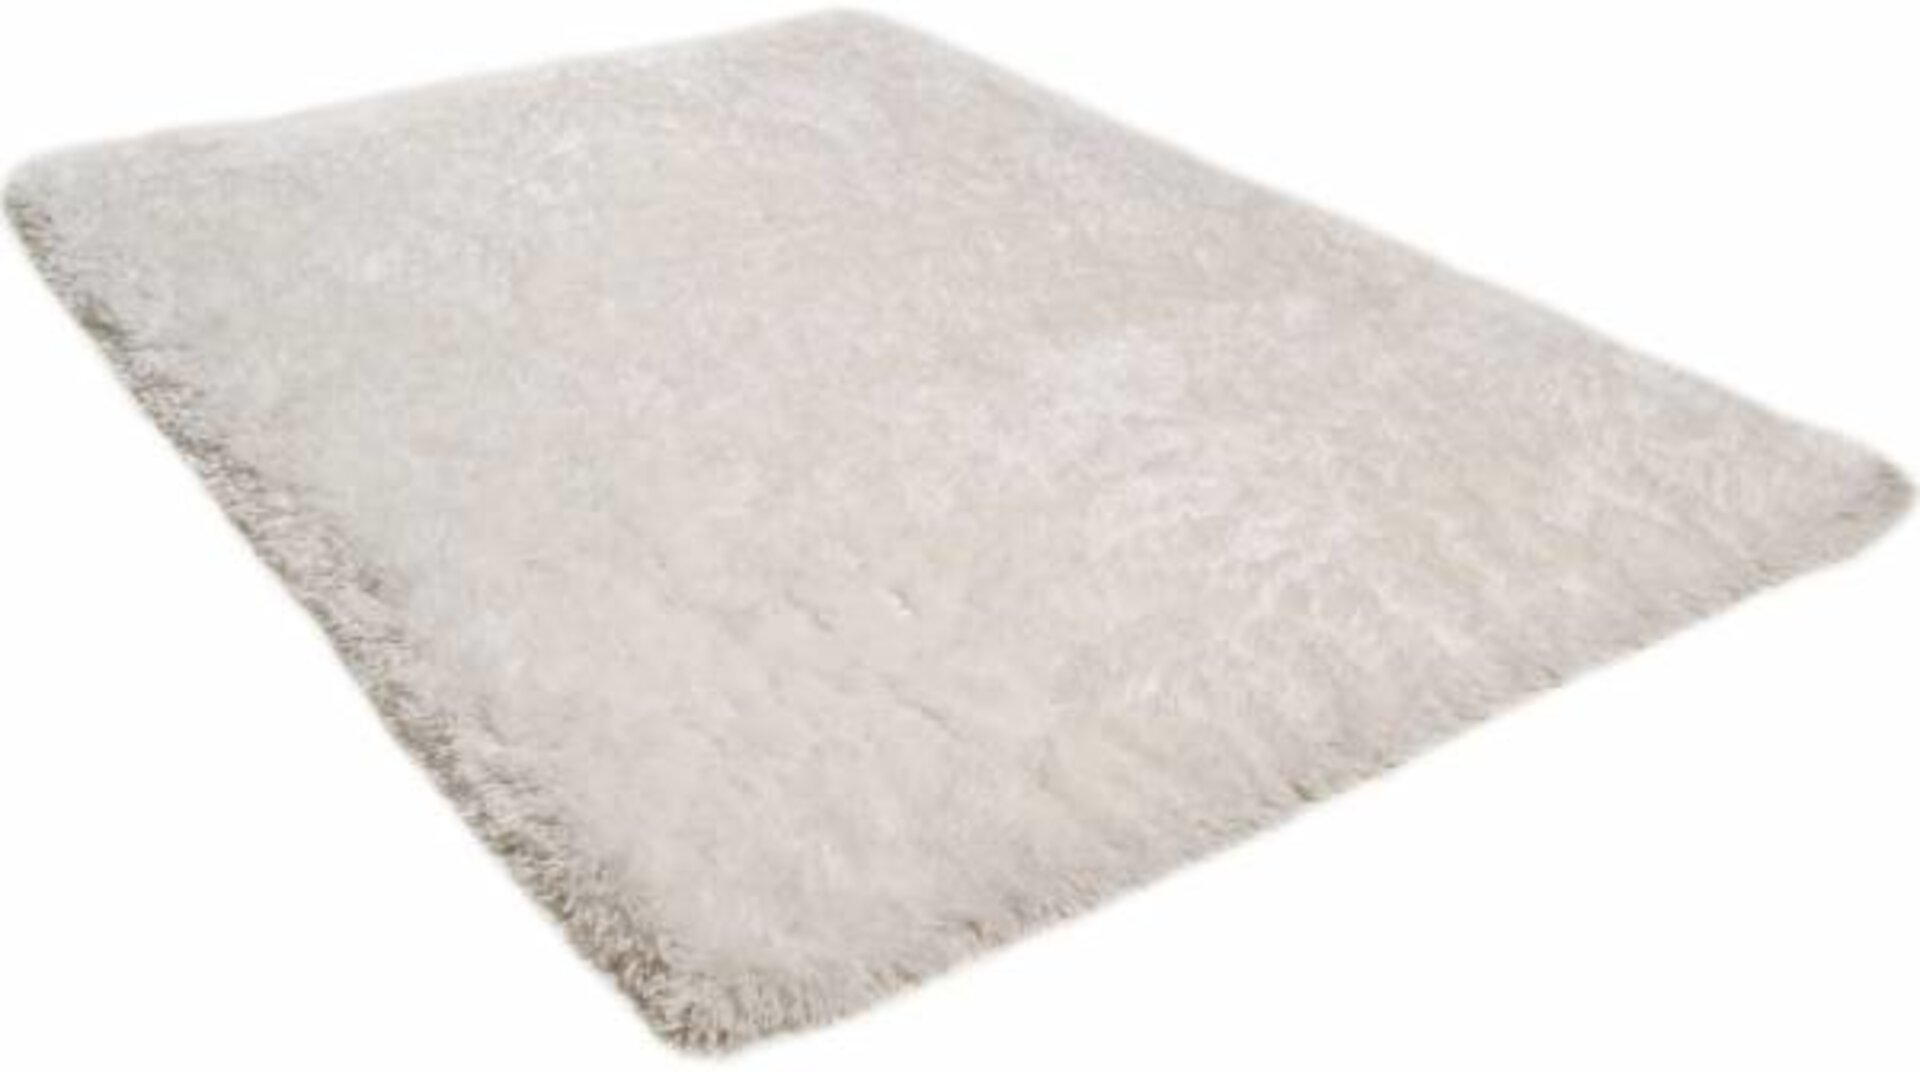 Handtuftteppich Flocati Tom Tailor Textil weiß 2 x 3 cm